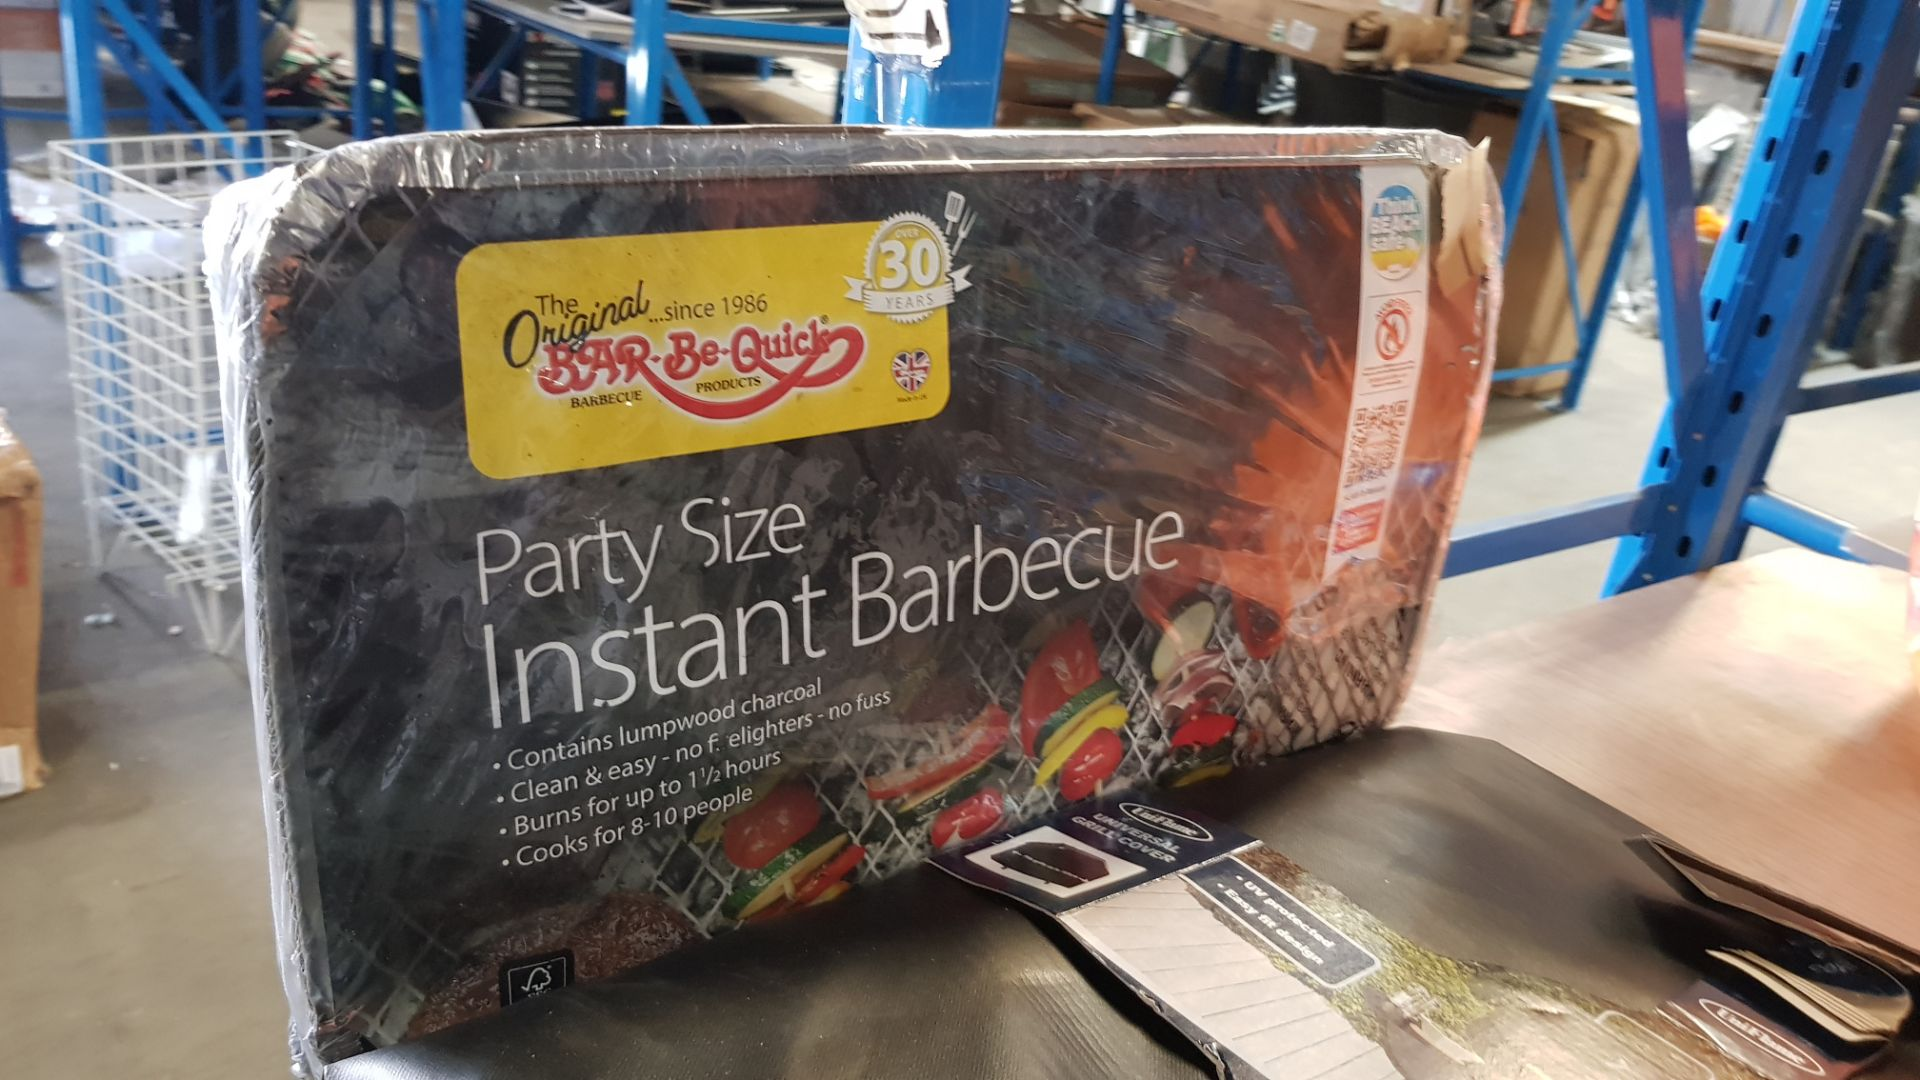 (3H) 4x BBQ Items. 1x Expert Grill The Big Portable Grill. 1x Expert Grill 75cm Barrell BBQ. 1x - Image 9 of 9